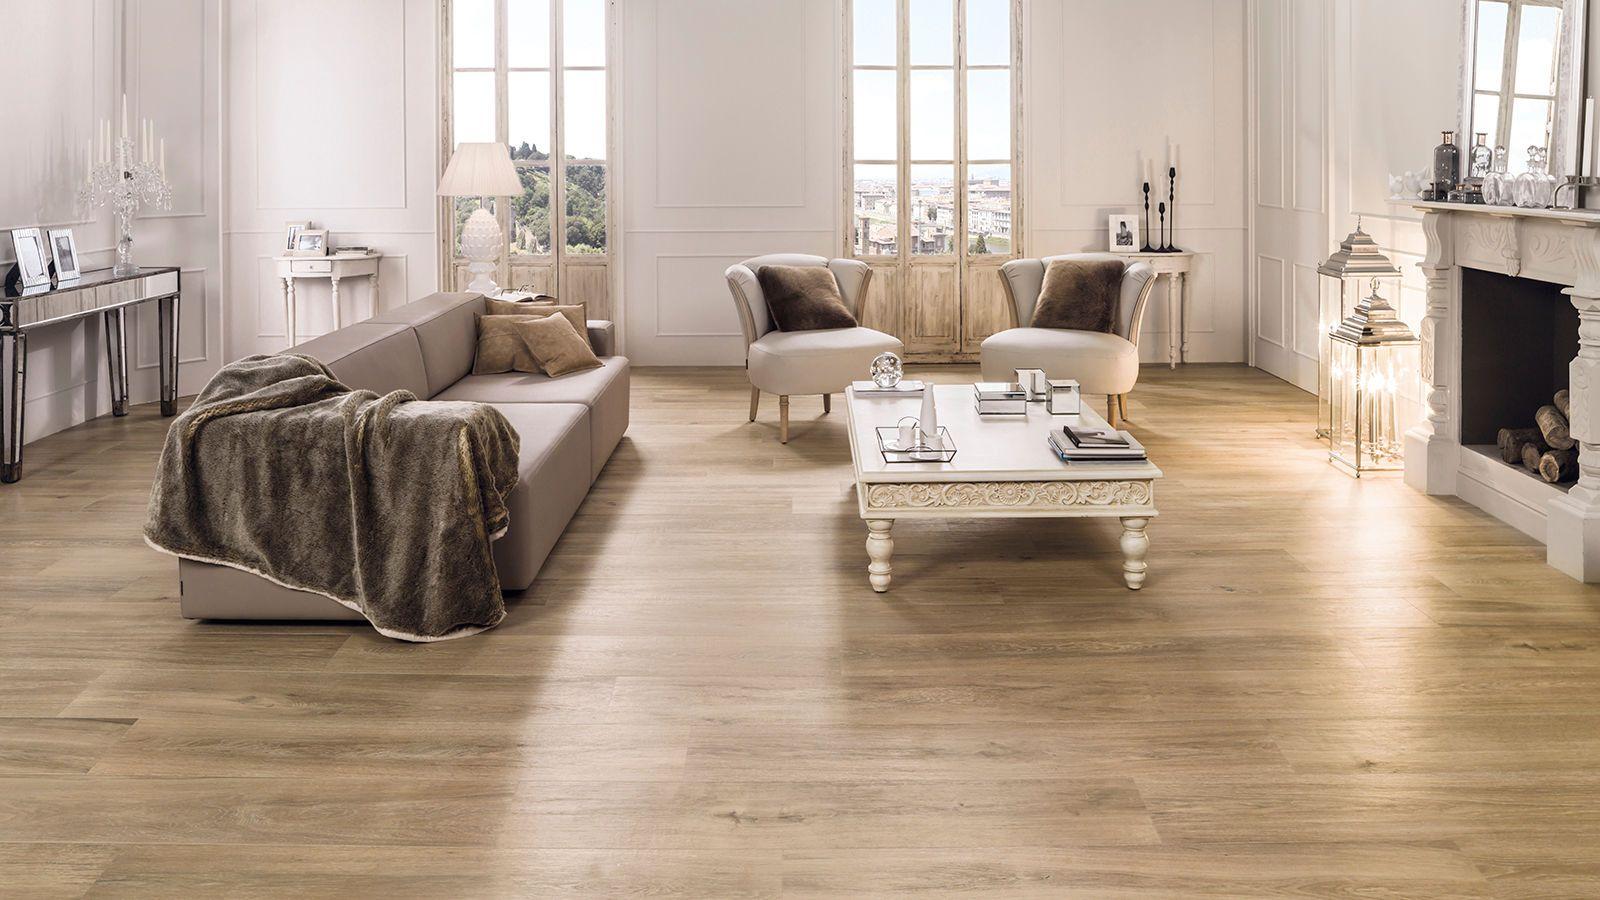 Pavimento starwood tanzania almond 25x150 cm suelos en - Suelo rectificado ...